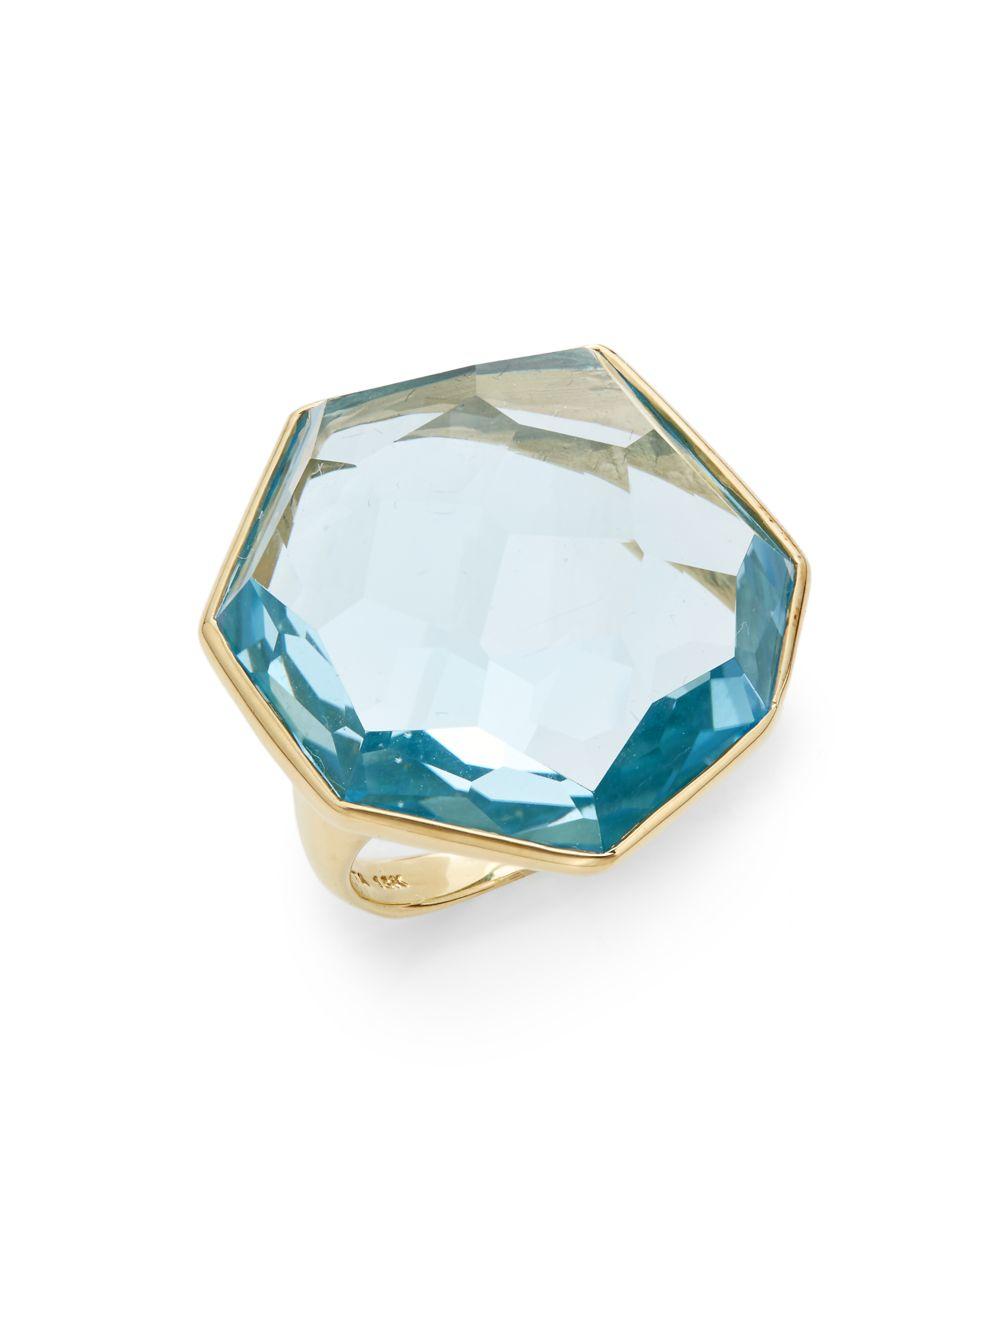 ippolita rock blue topaz 18k yellow gold ring in